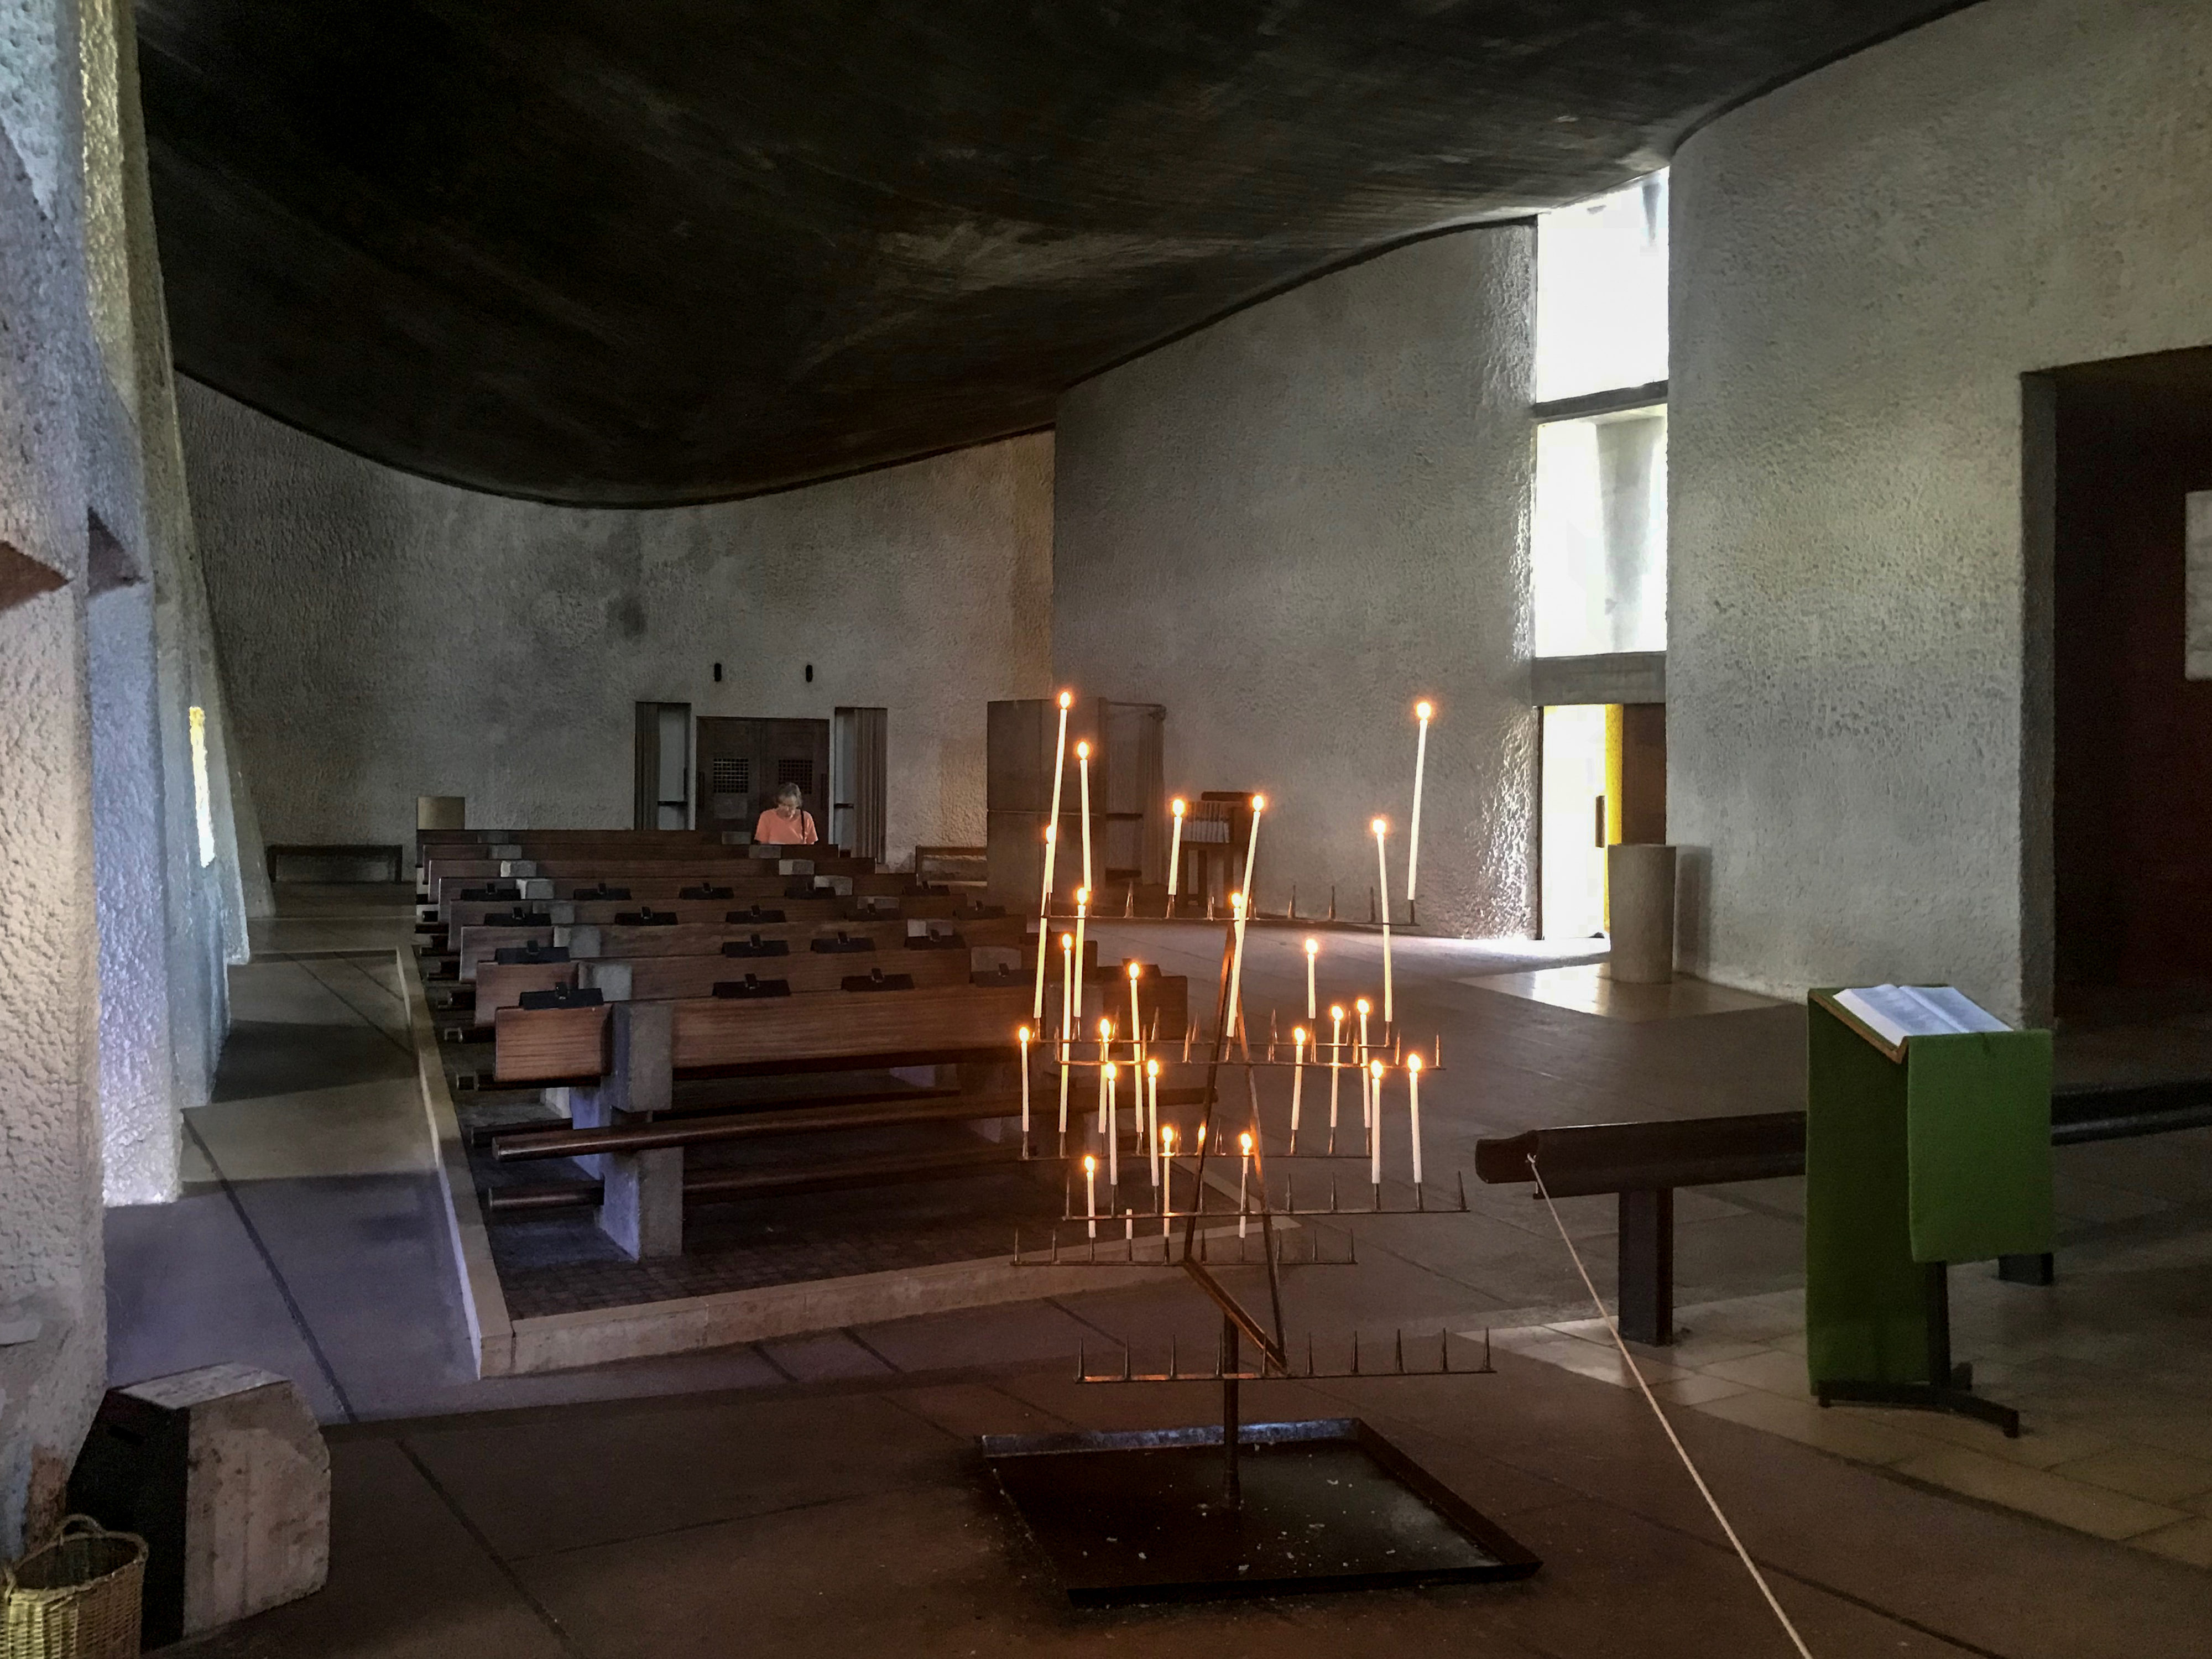 Ronchamp Innenraum vom Altar